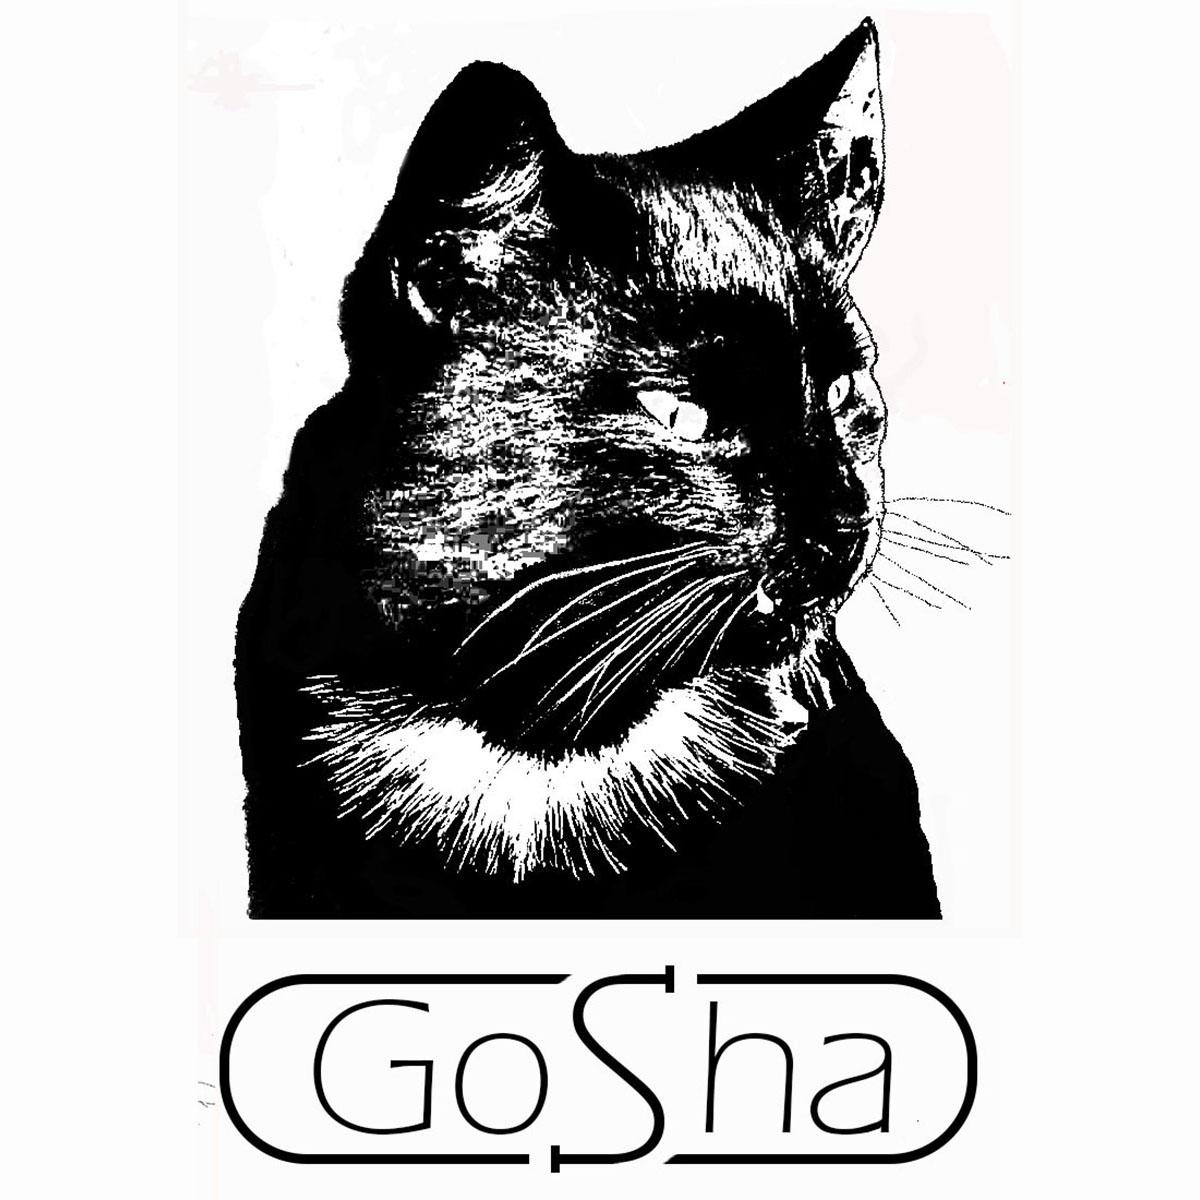 Gosha-logo-5